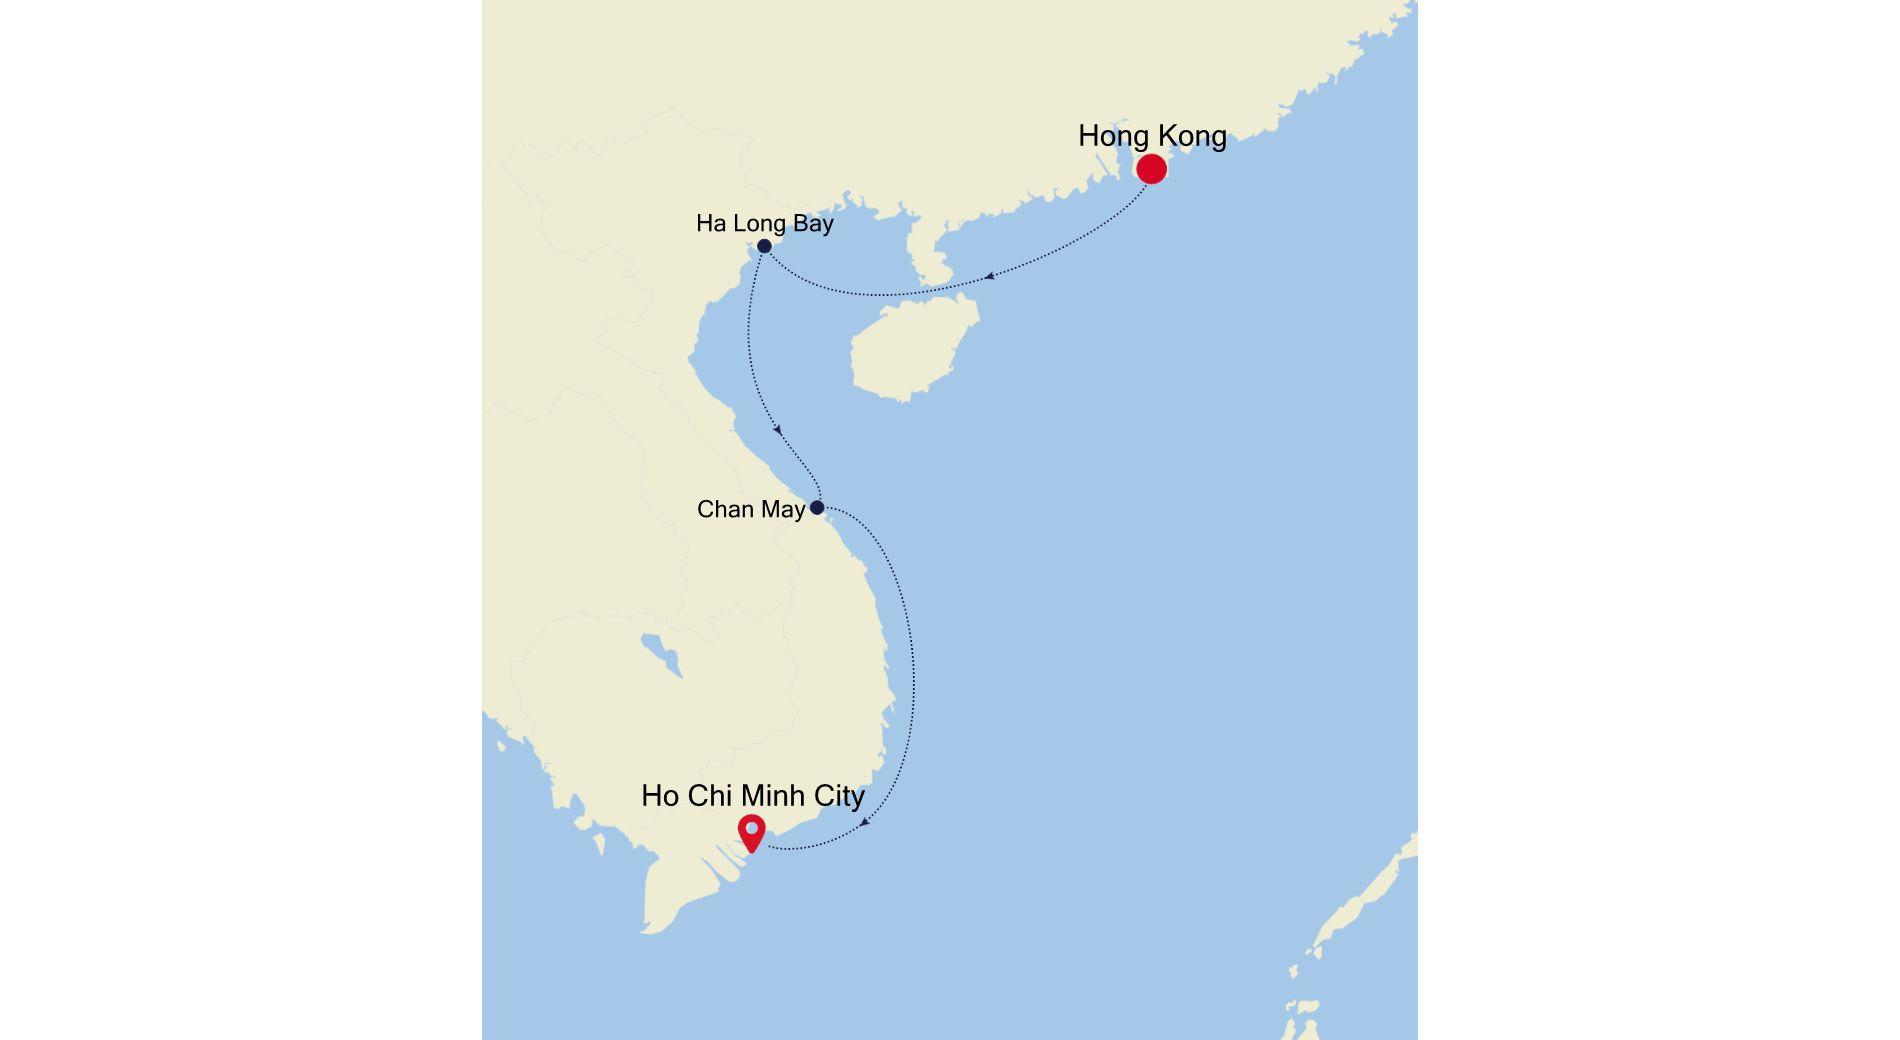 5004E - Hong Kong à Ho Chi Minh City